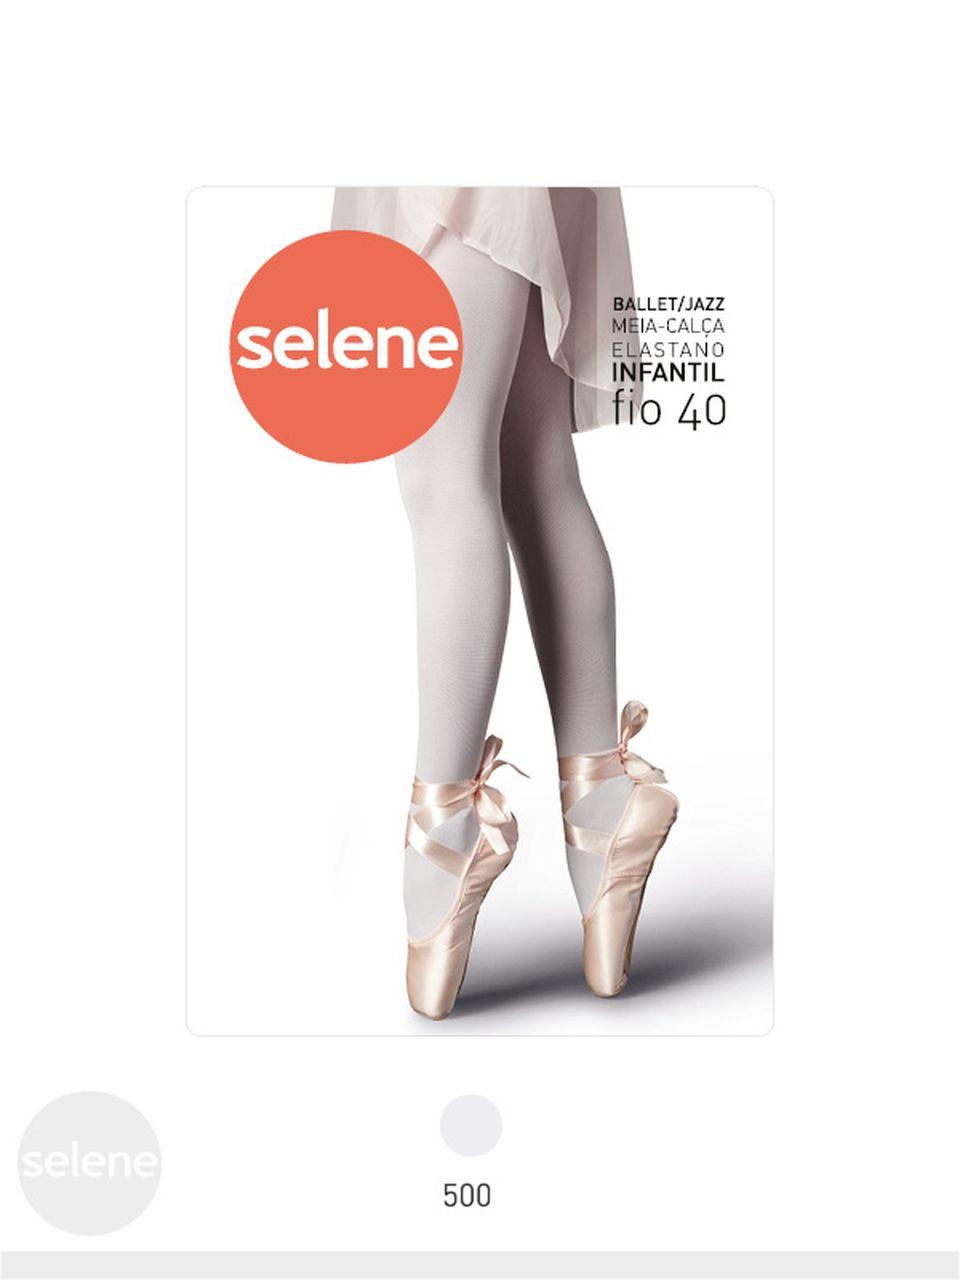 Meia Calça Selene Fio 40 Ballet (9580)